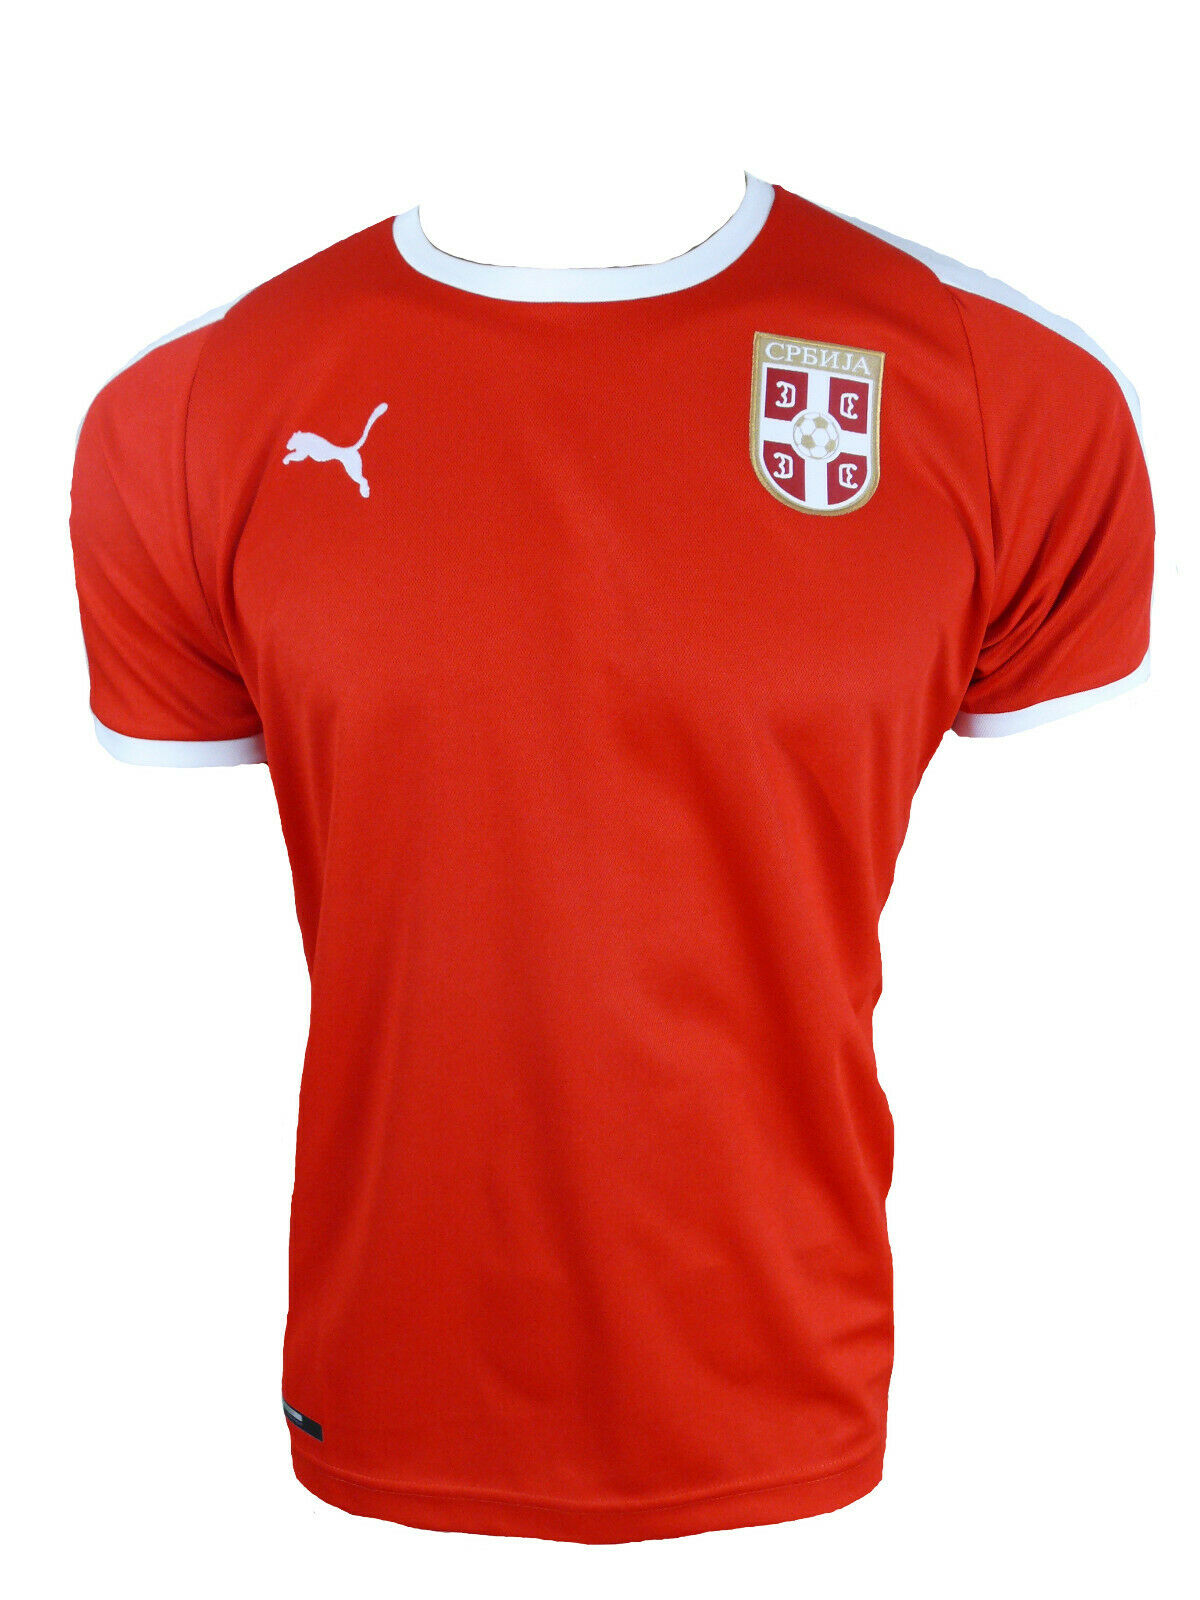 Puma Serbien Serbien Serbien Home Trikot Jersey Gr. XL 433212